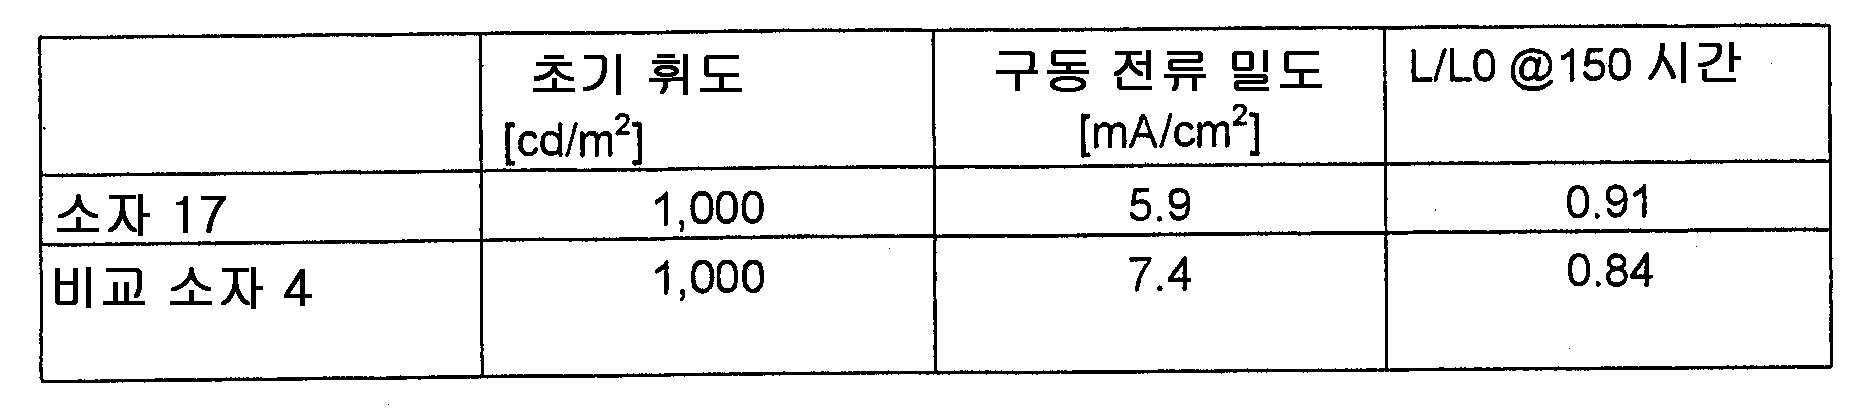 Figure 112010002231902-pat00180